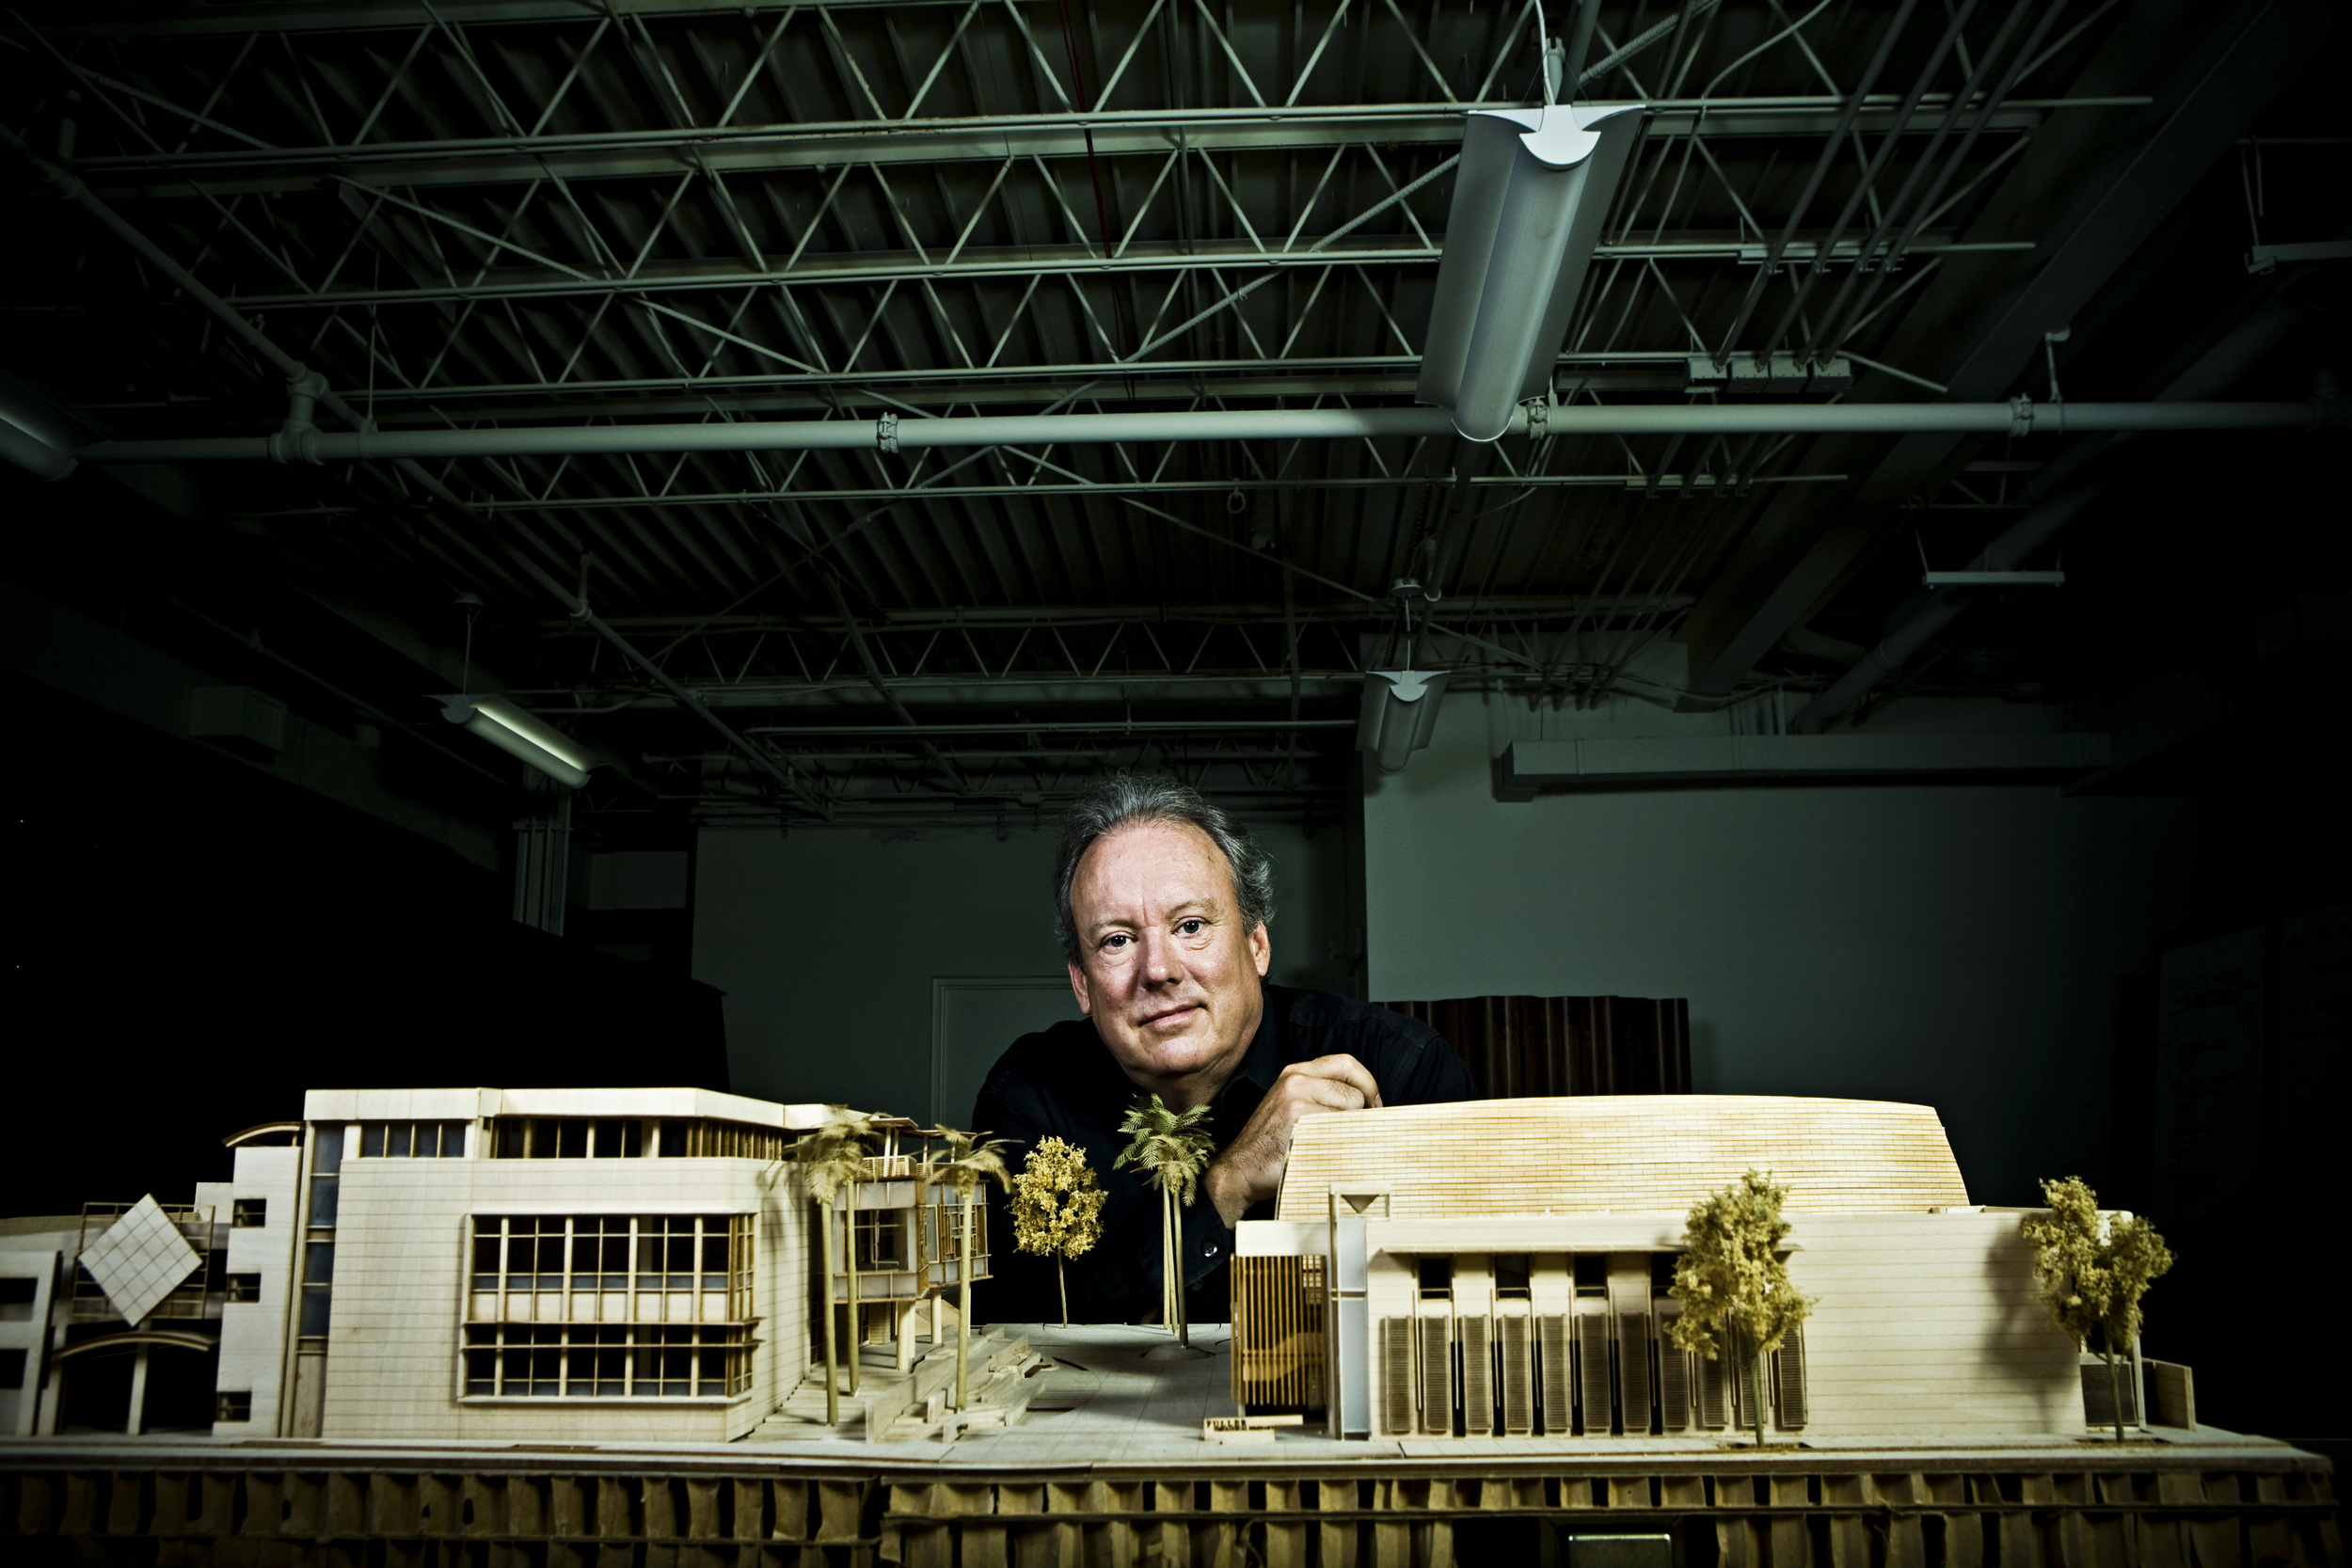 Architect William McDonough